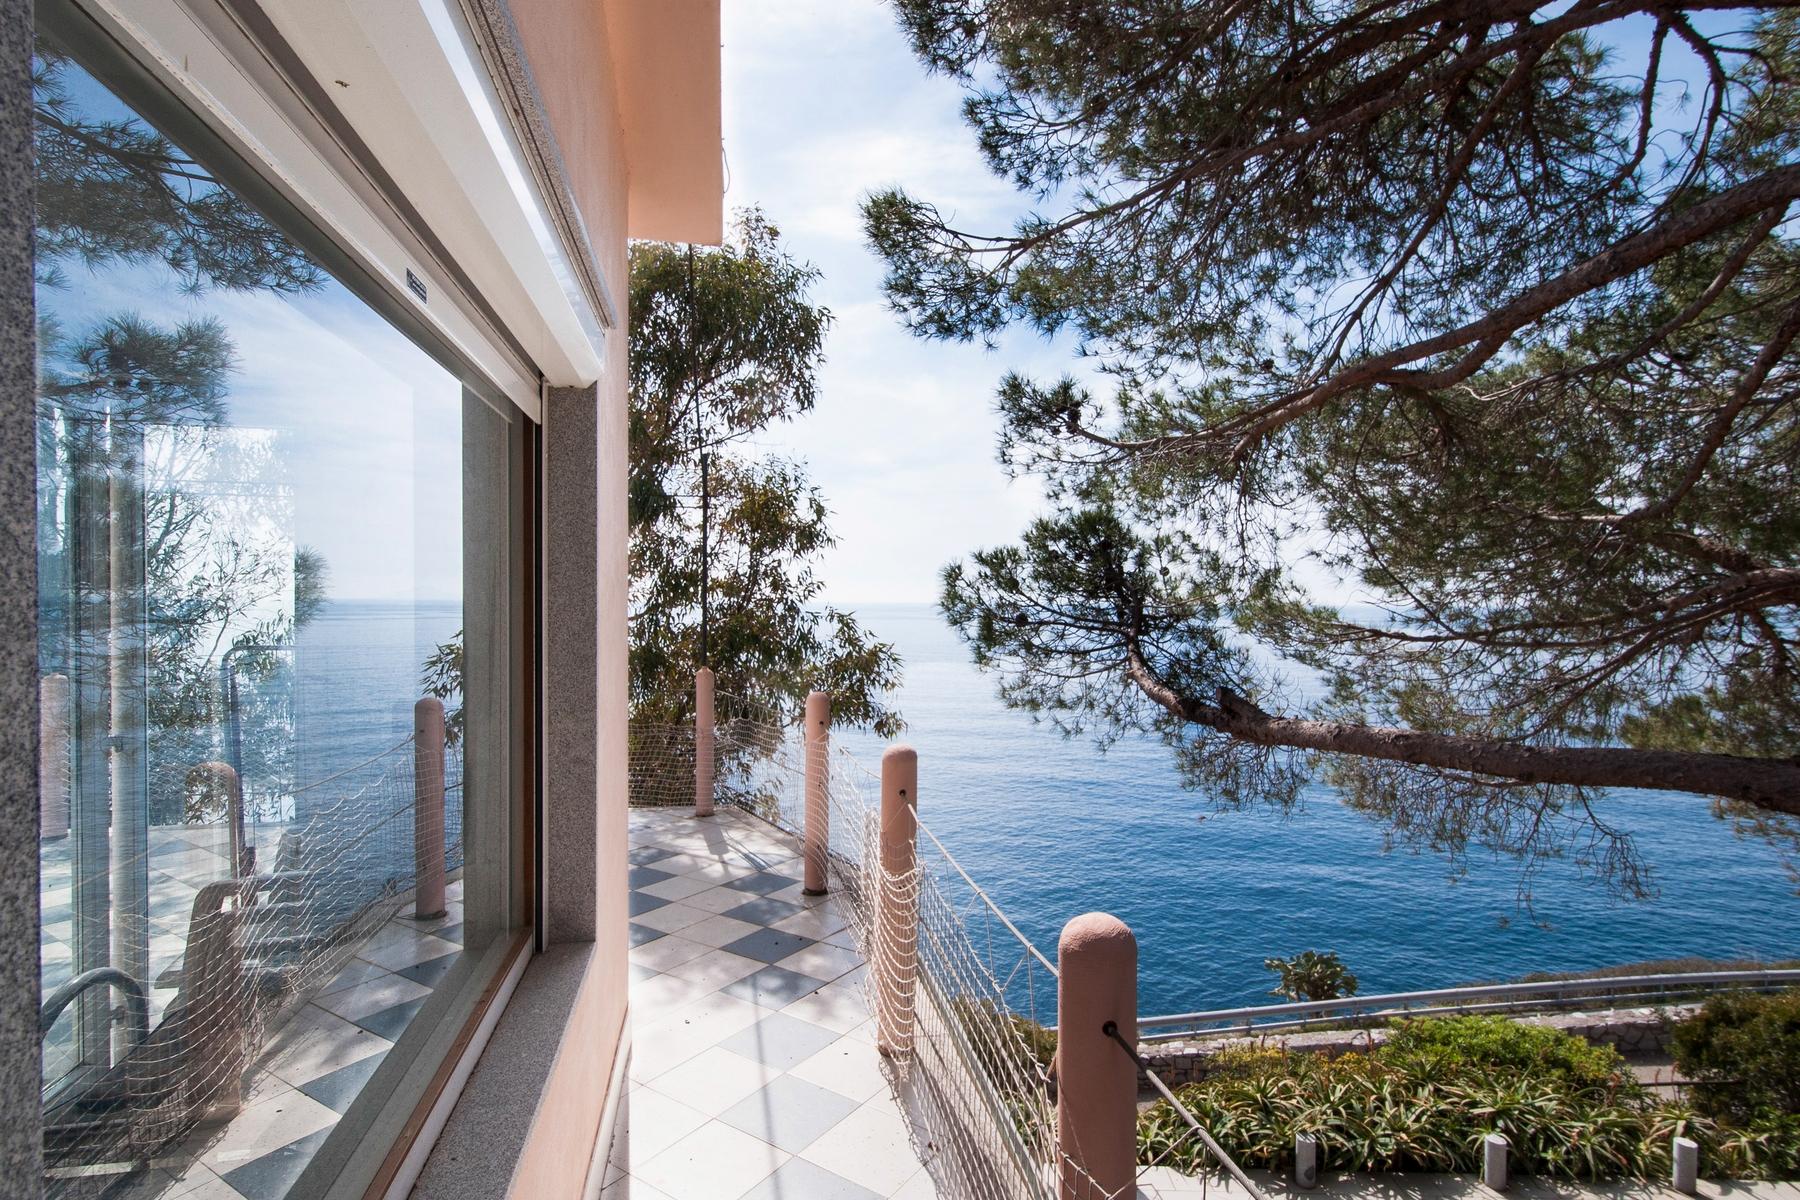 Maison unifamiliale pour l Vente à Waterfront villa with pool at Isola d'Elba Campo Nell'elba, Livorno 57034 Italie